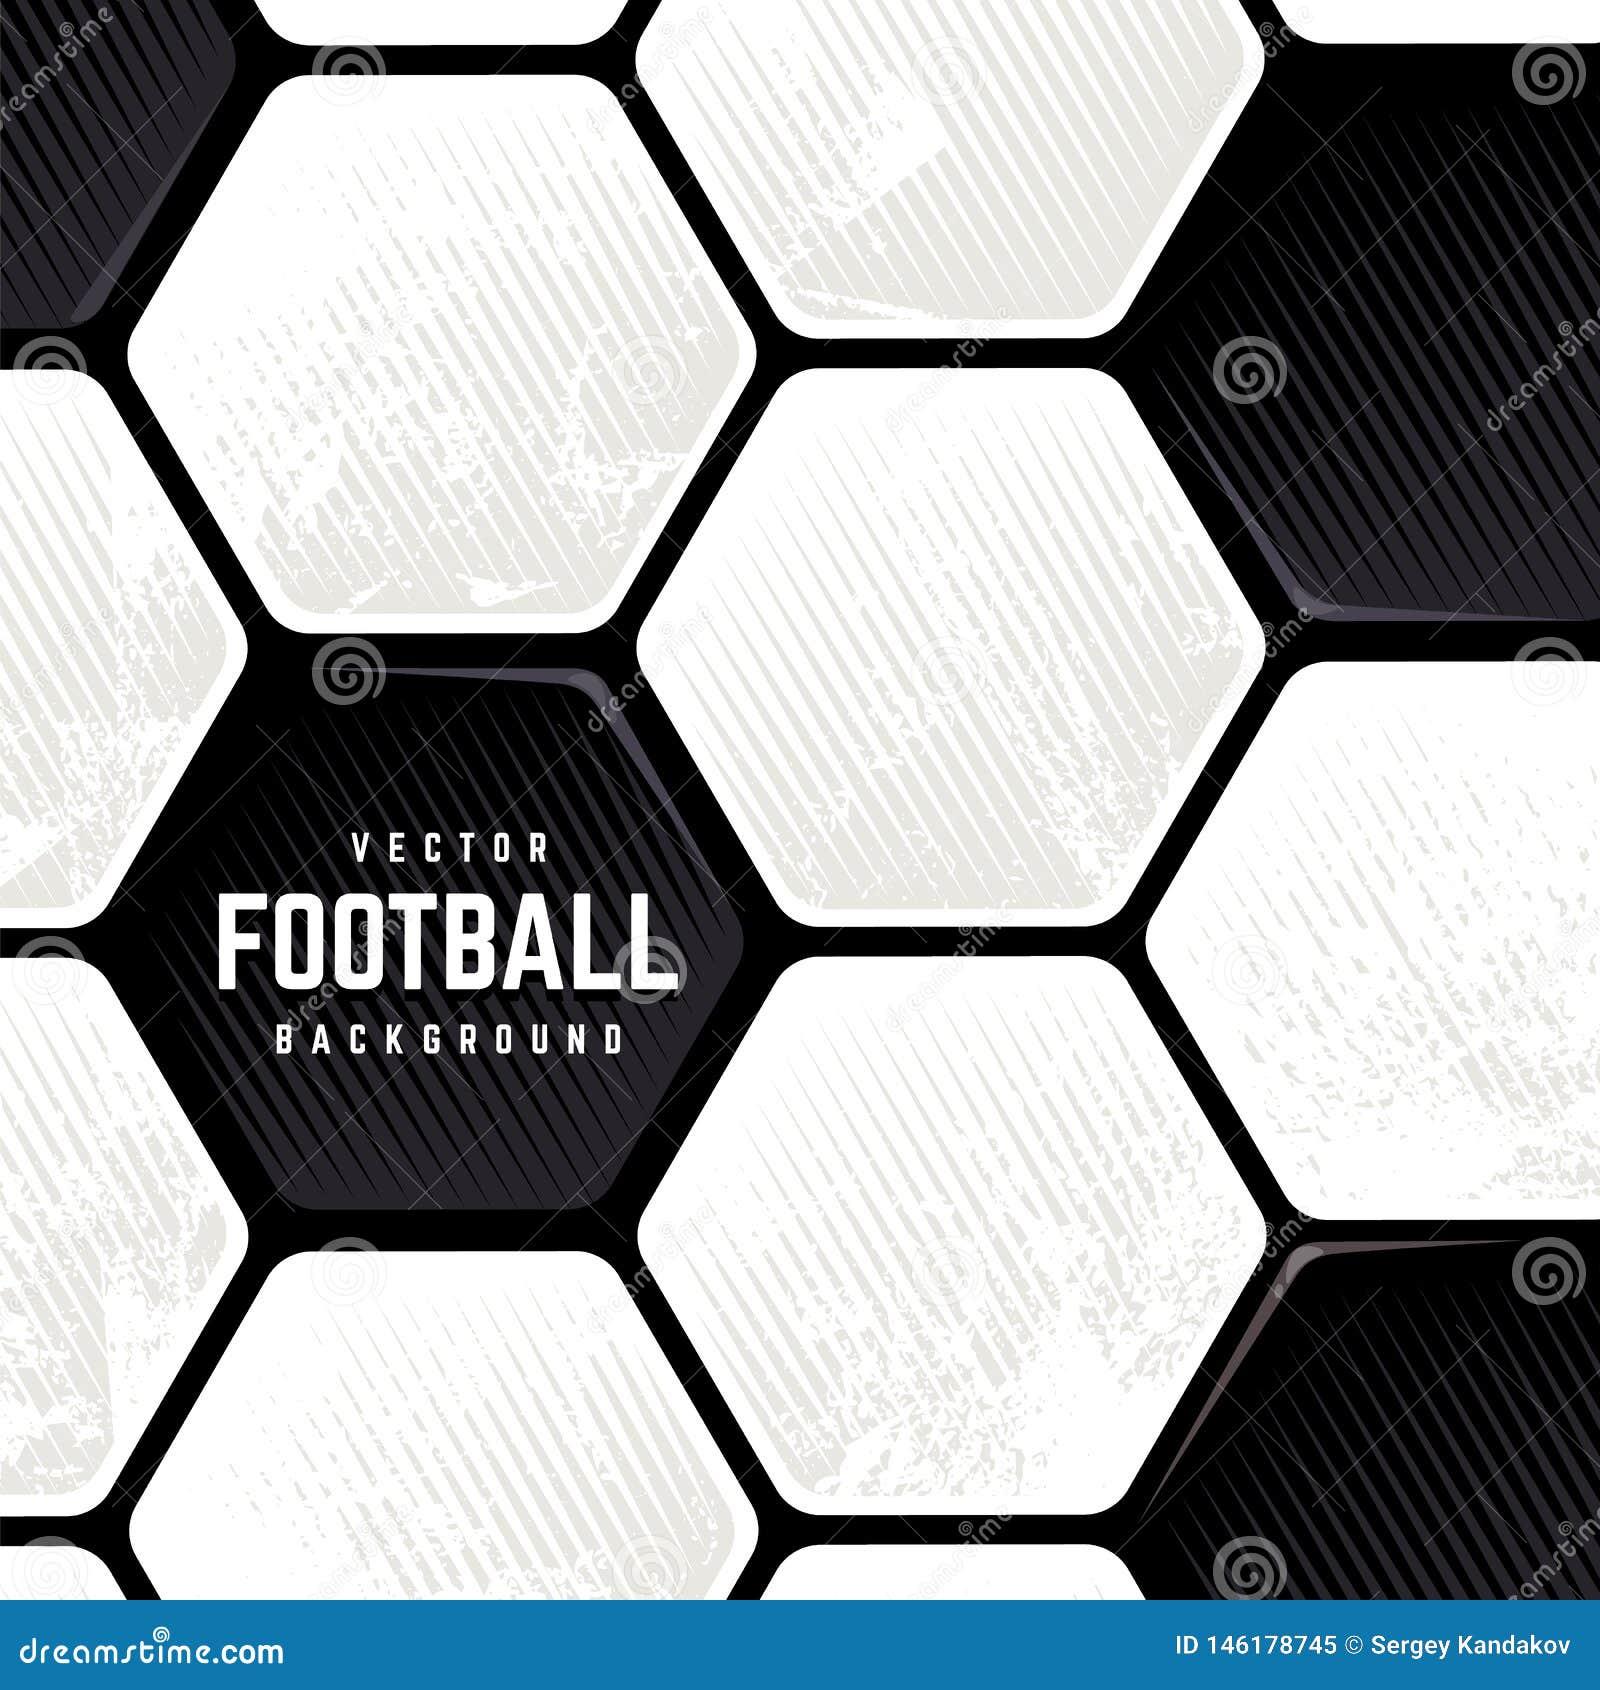 Grungefotbollbollen ytbehandlar bakgrund